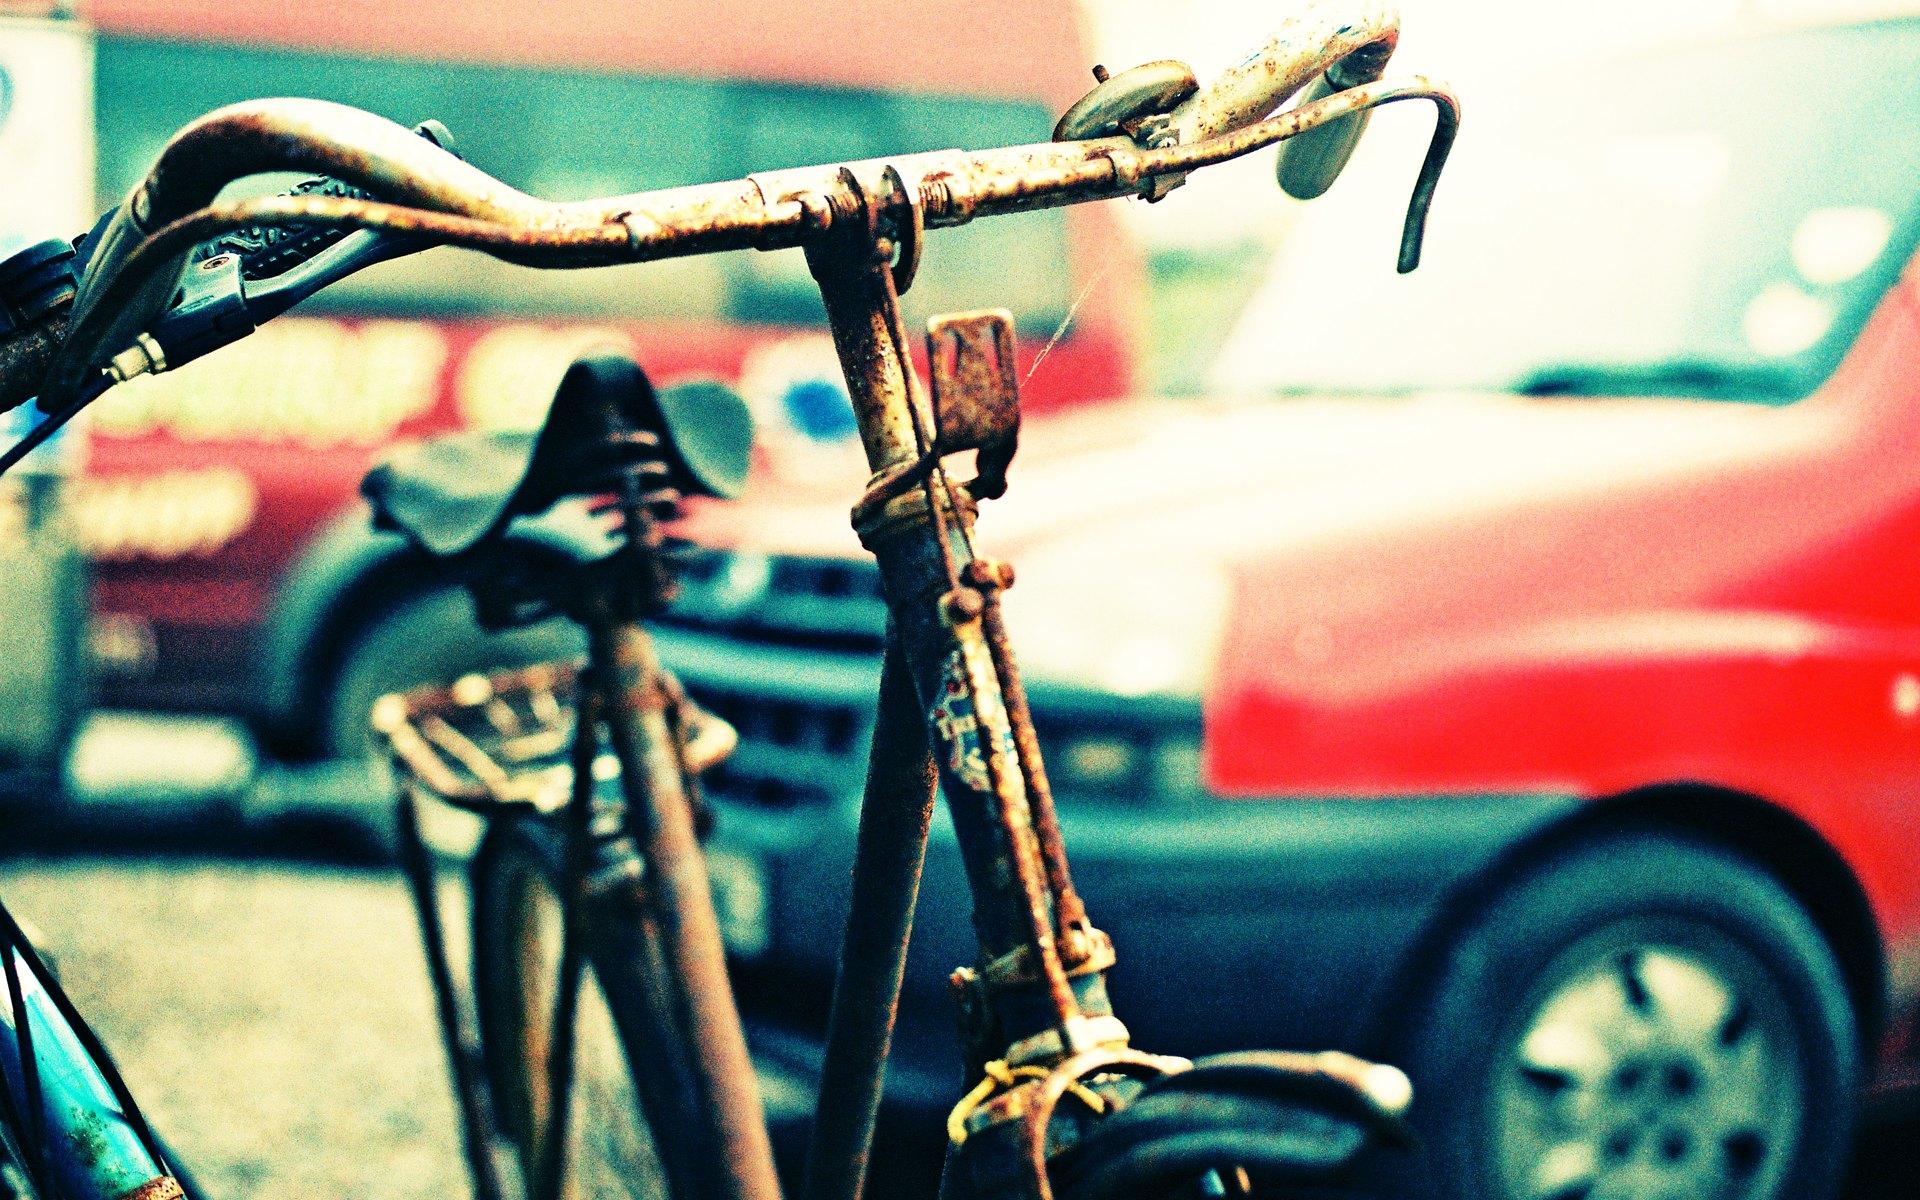 lomography rusty bike wallpaper 49164